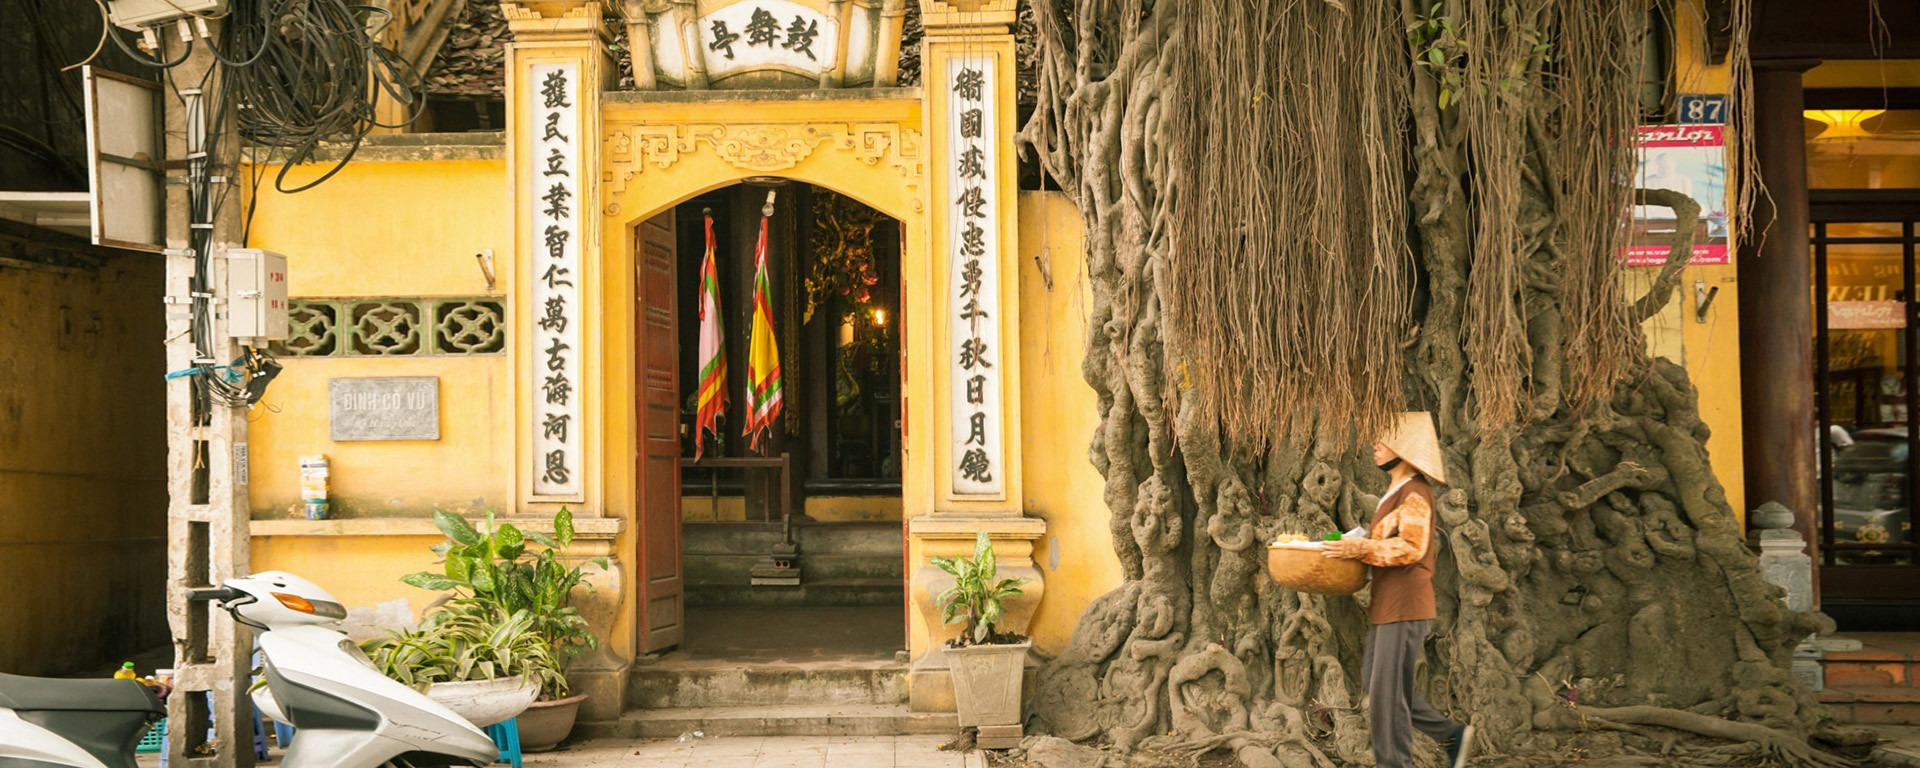 Hanoi attraction banner